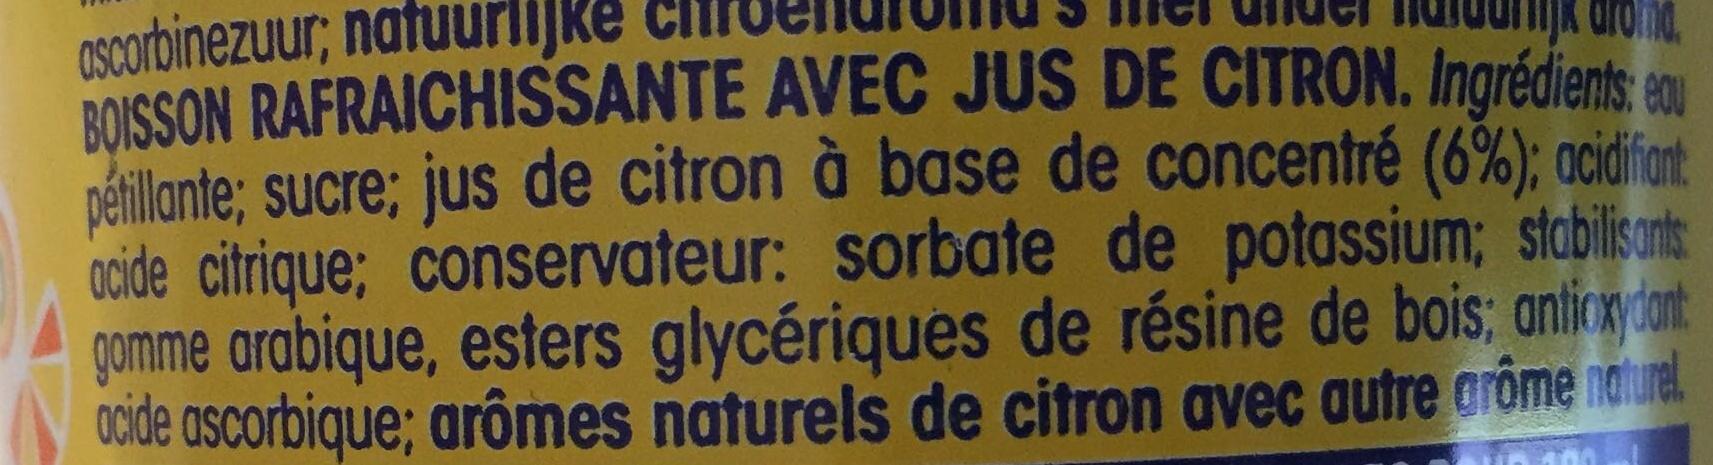 Fanta limón - Ingredients